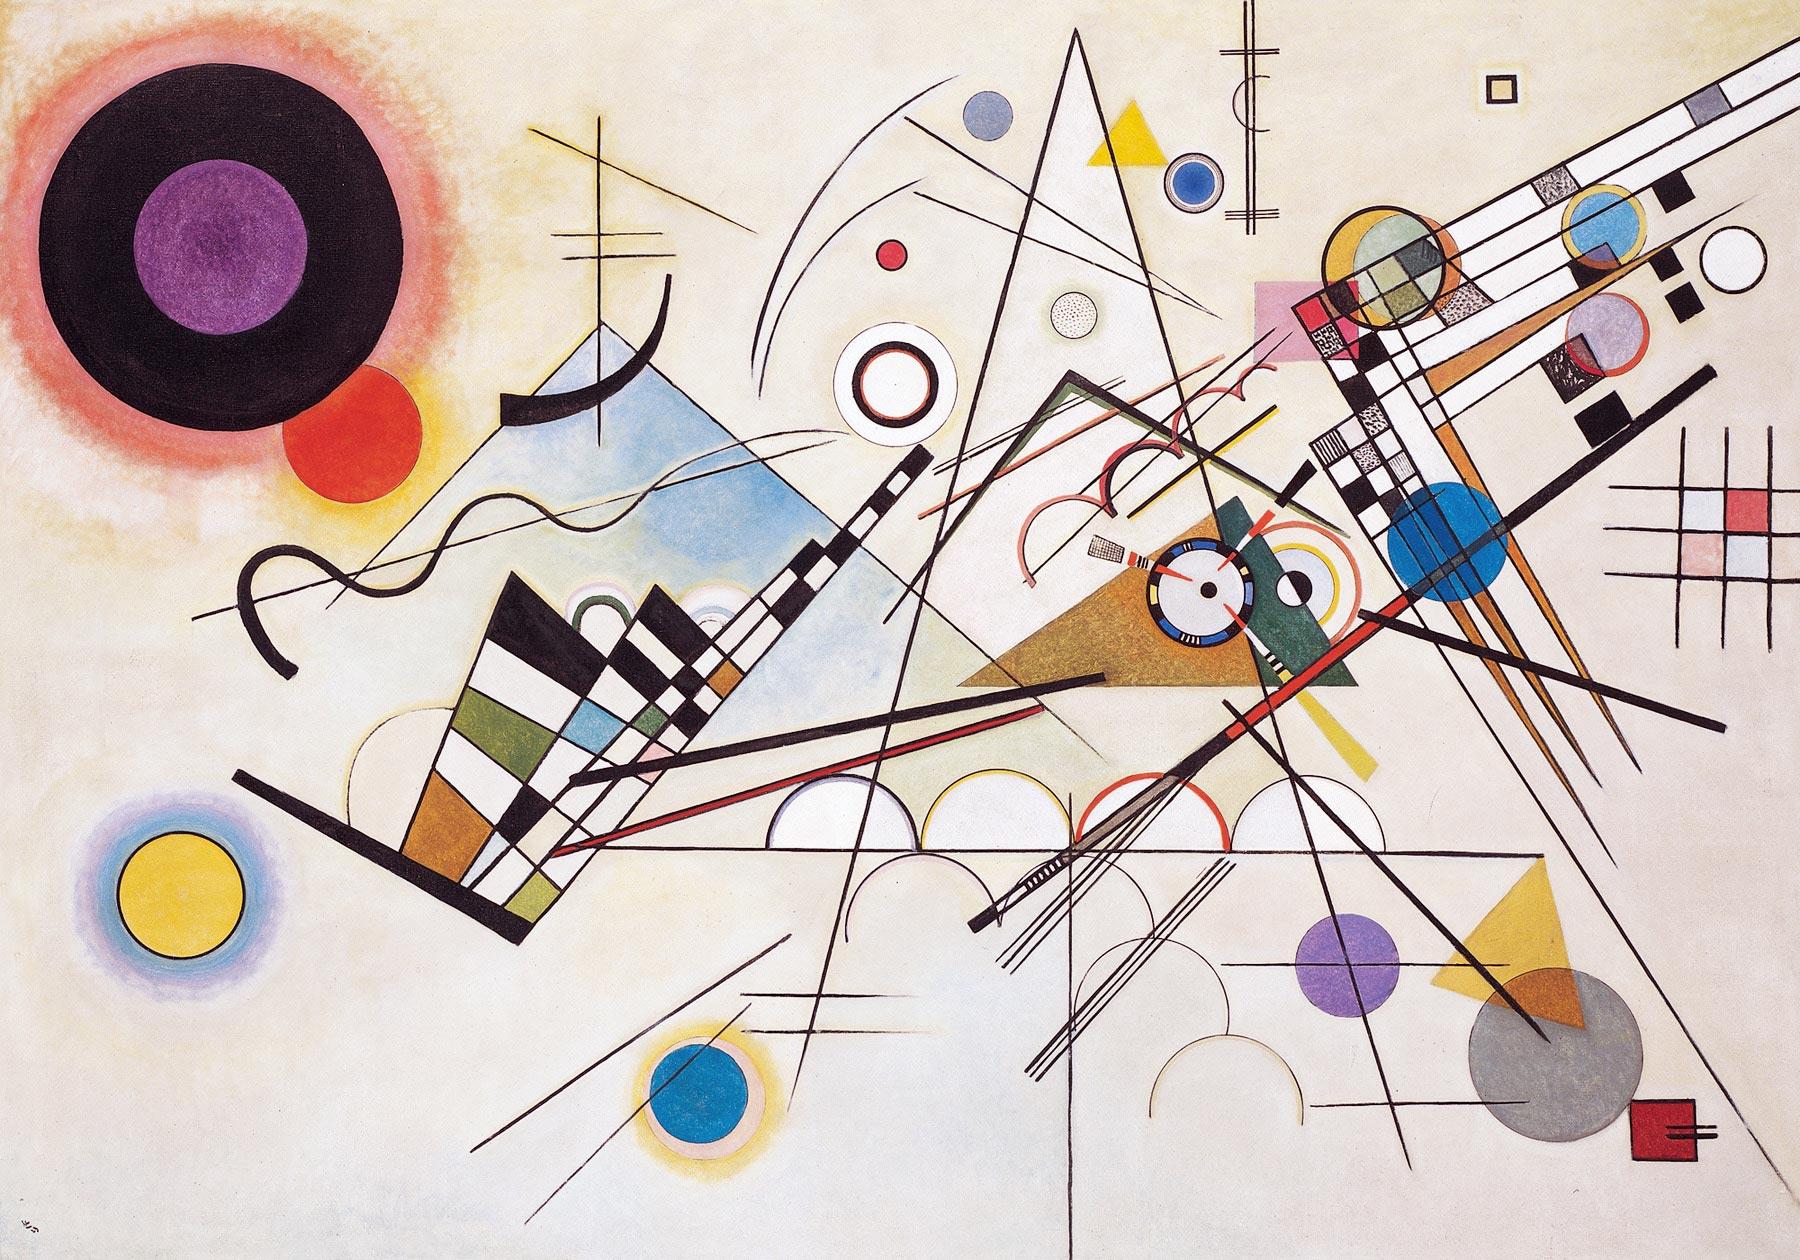 Wassily Kandinsky, Composition VIII (1923)